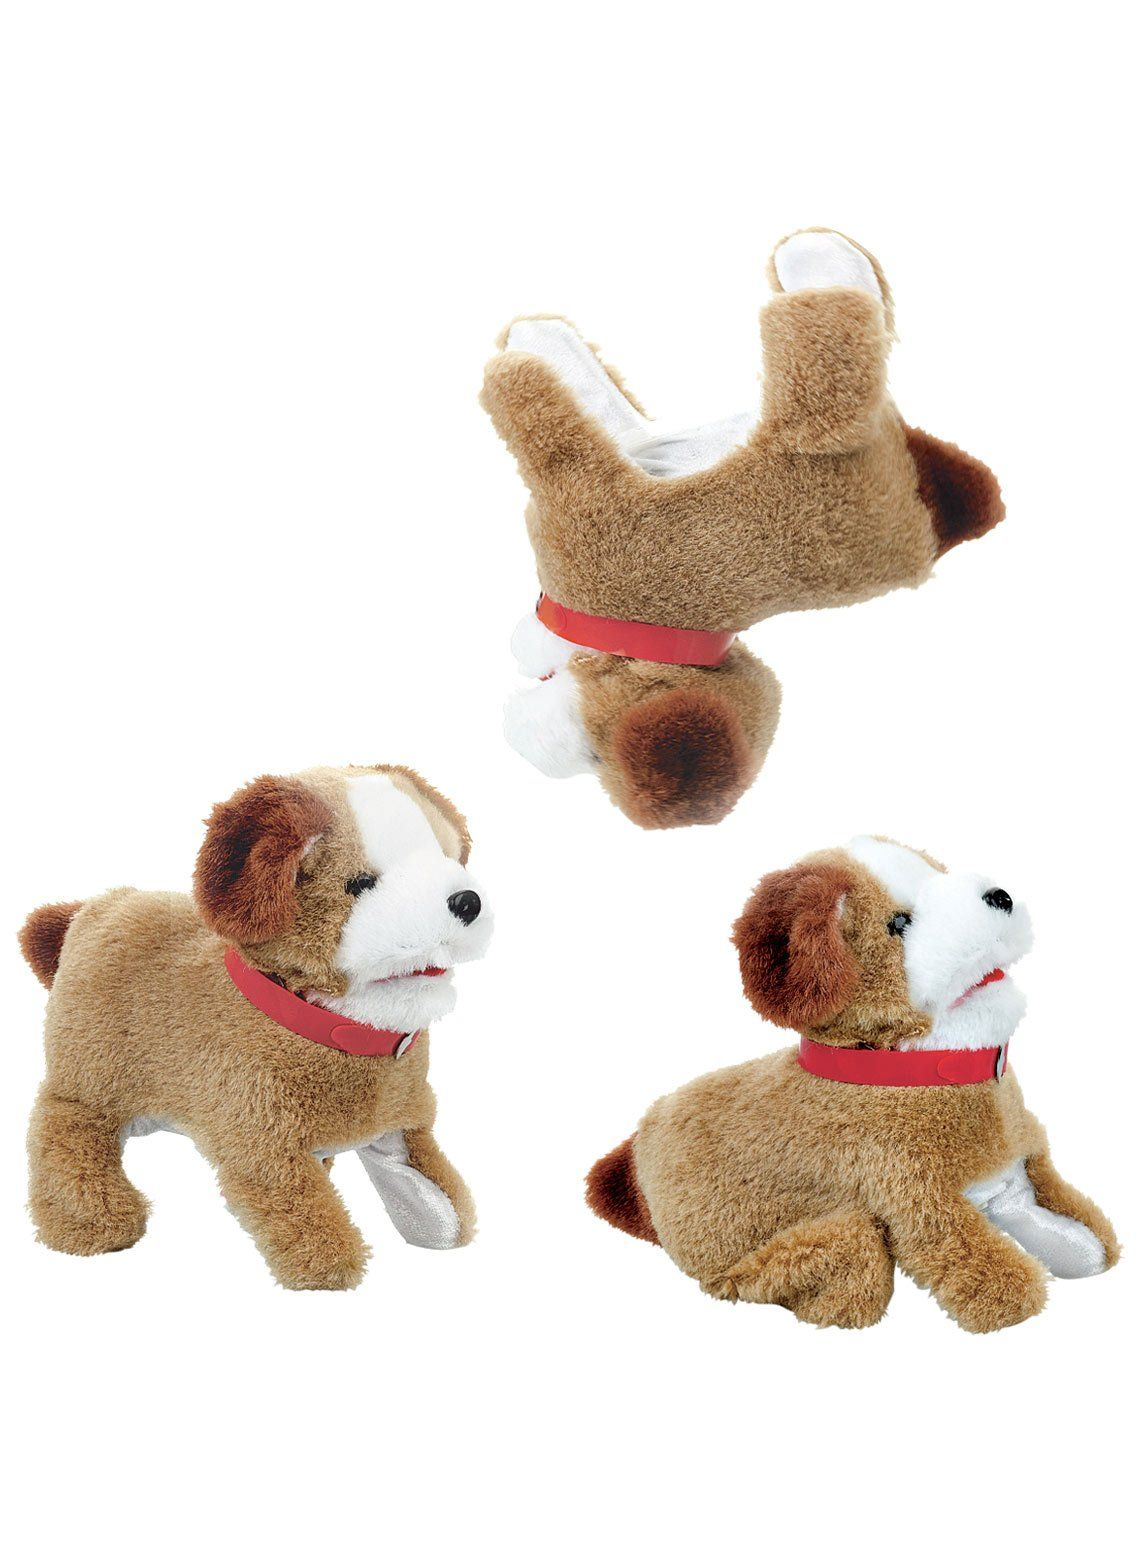 Puppies R Us Dog Toys Ideas